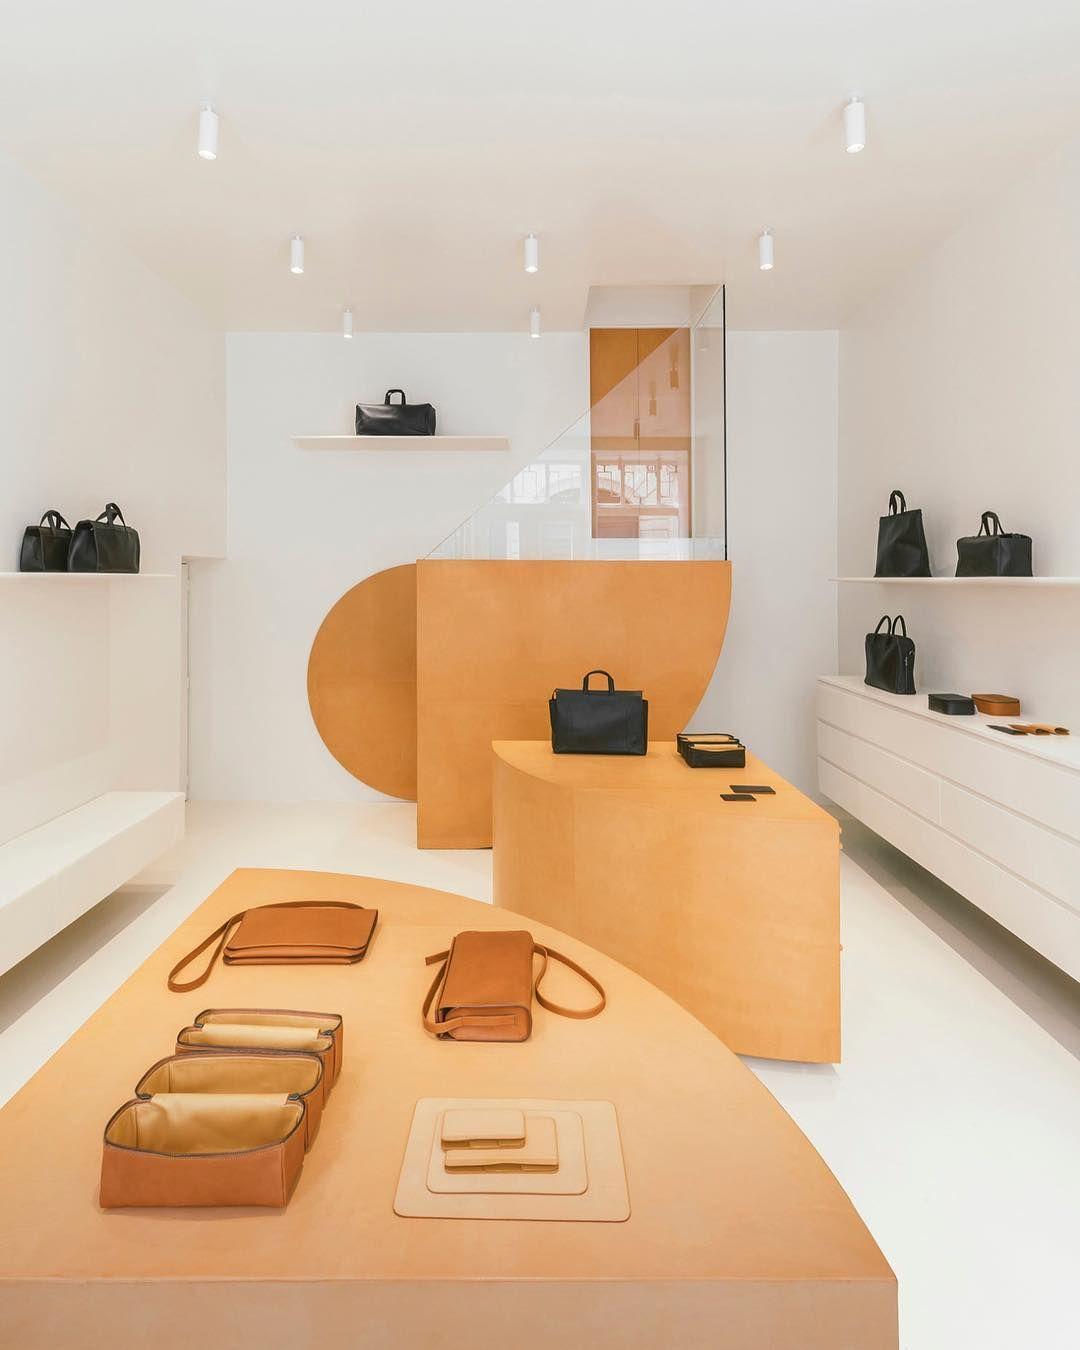 Isaac Reina by Bernard Dubois Paris, France #retaildesign | Retail design,  Interior design furniture, Retail interior